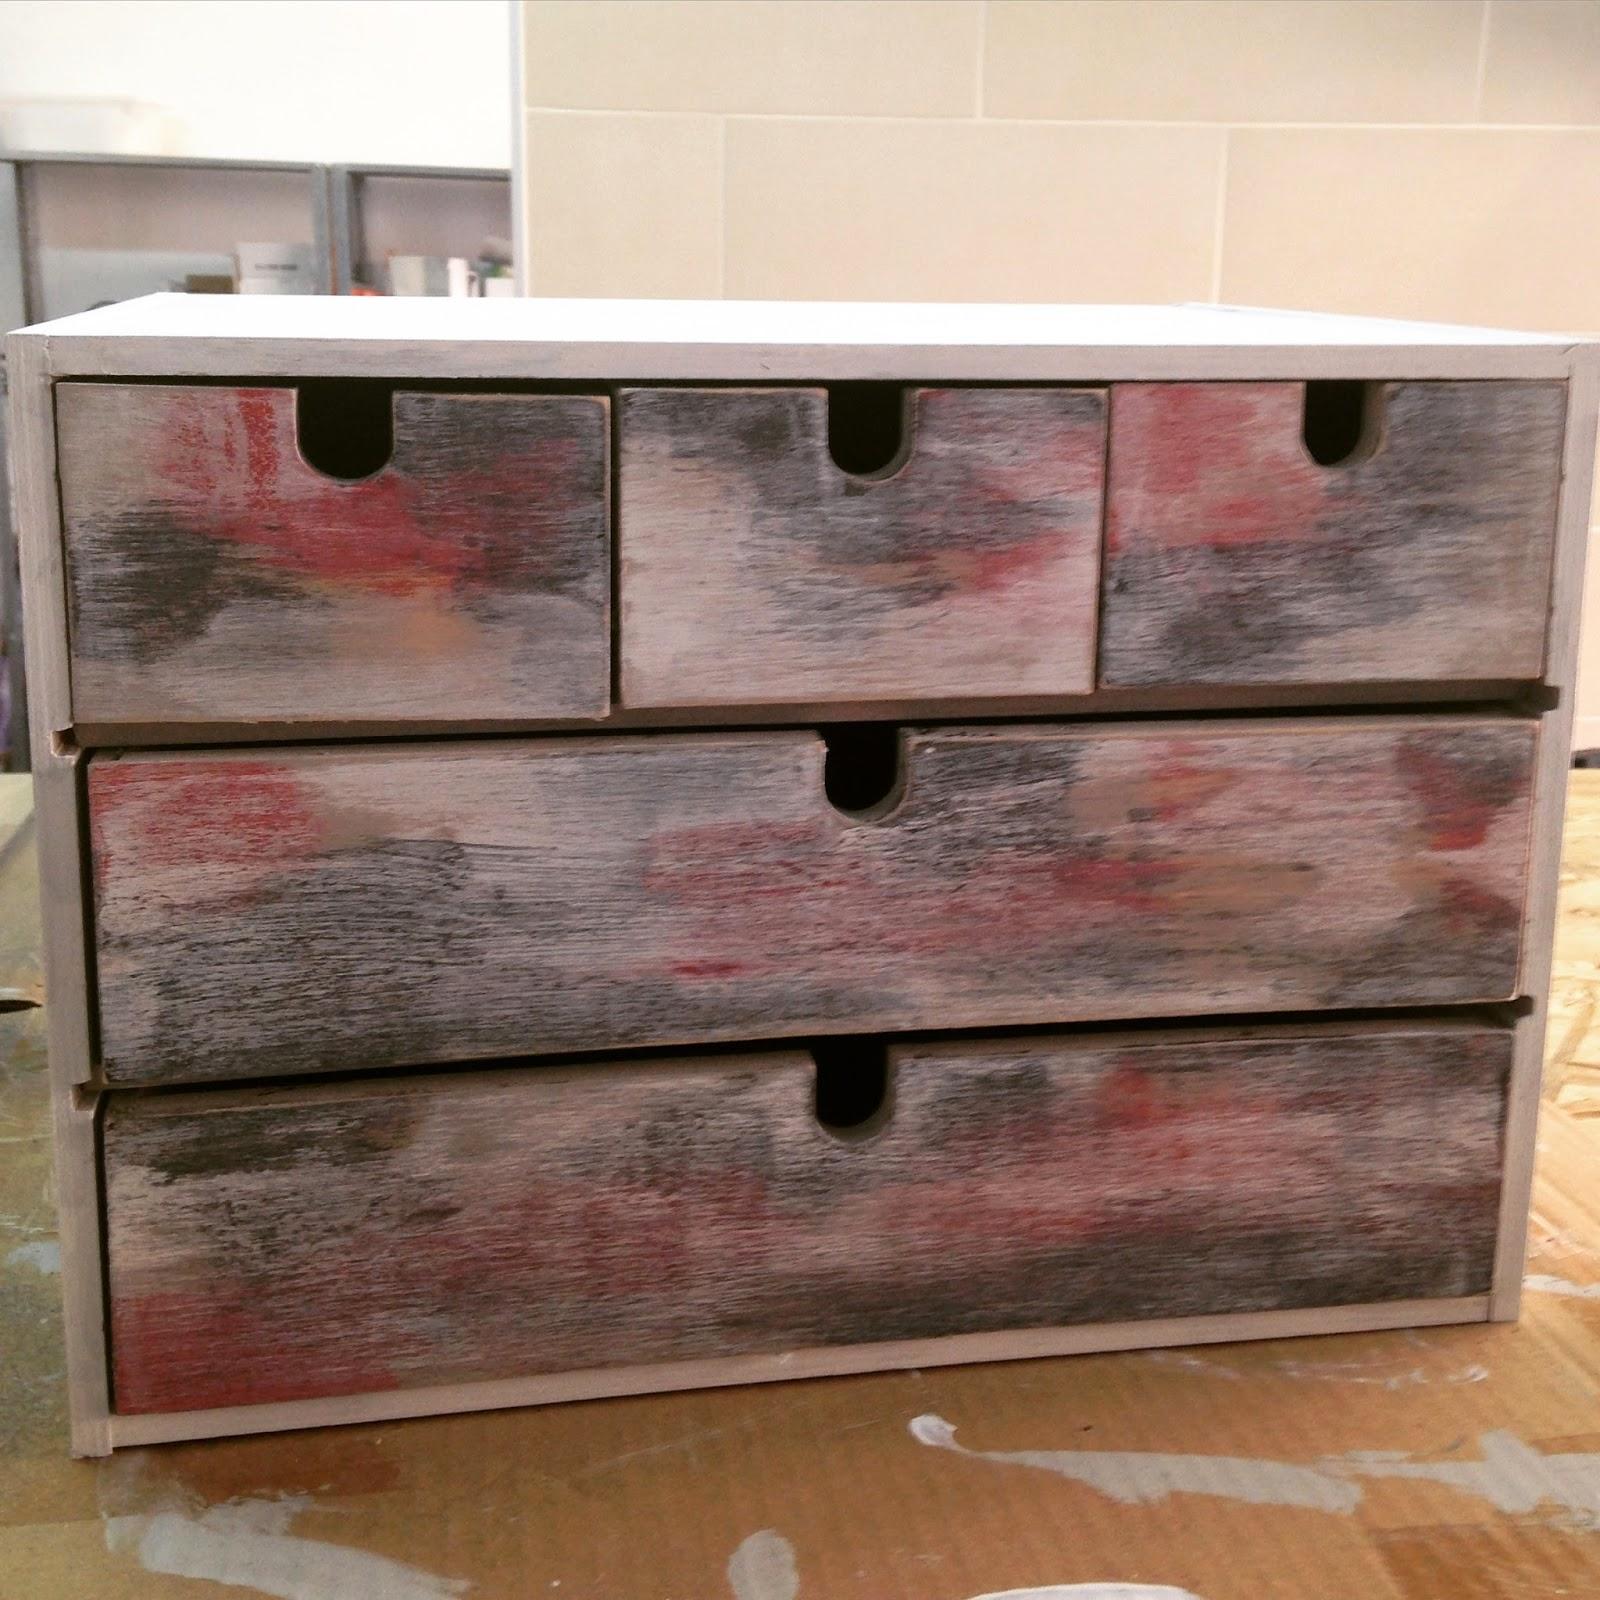 Personalizar cajonera MOPPE de Ikea con pintura ChalkPaint